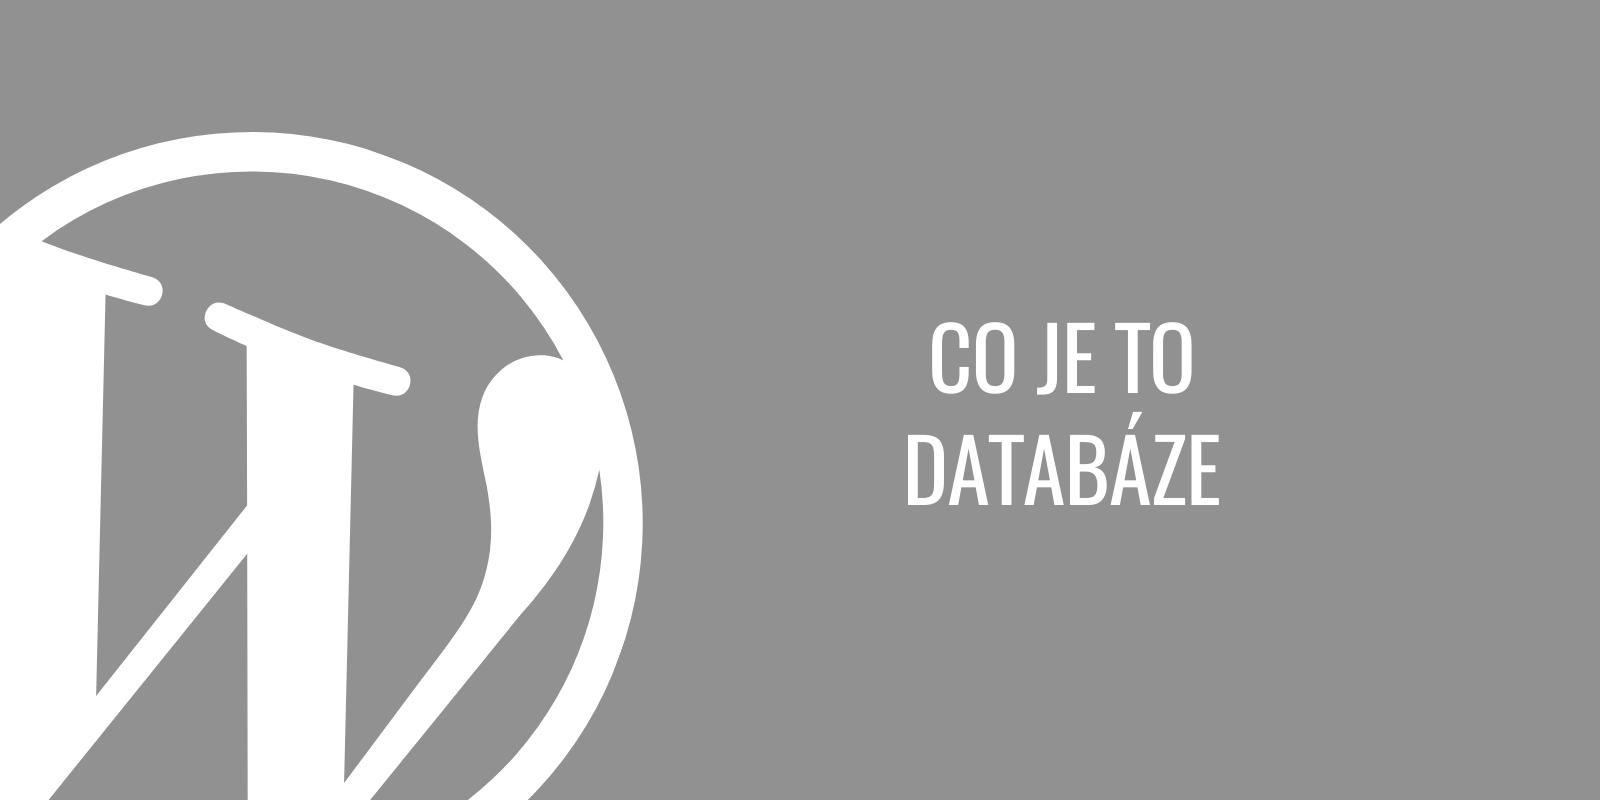 Co je to databáze